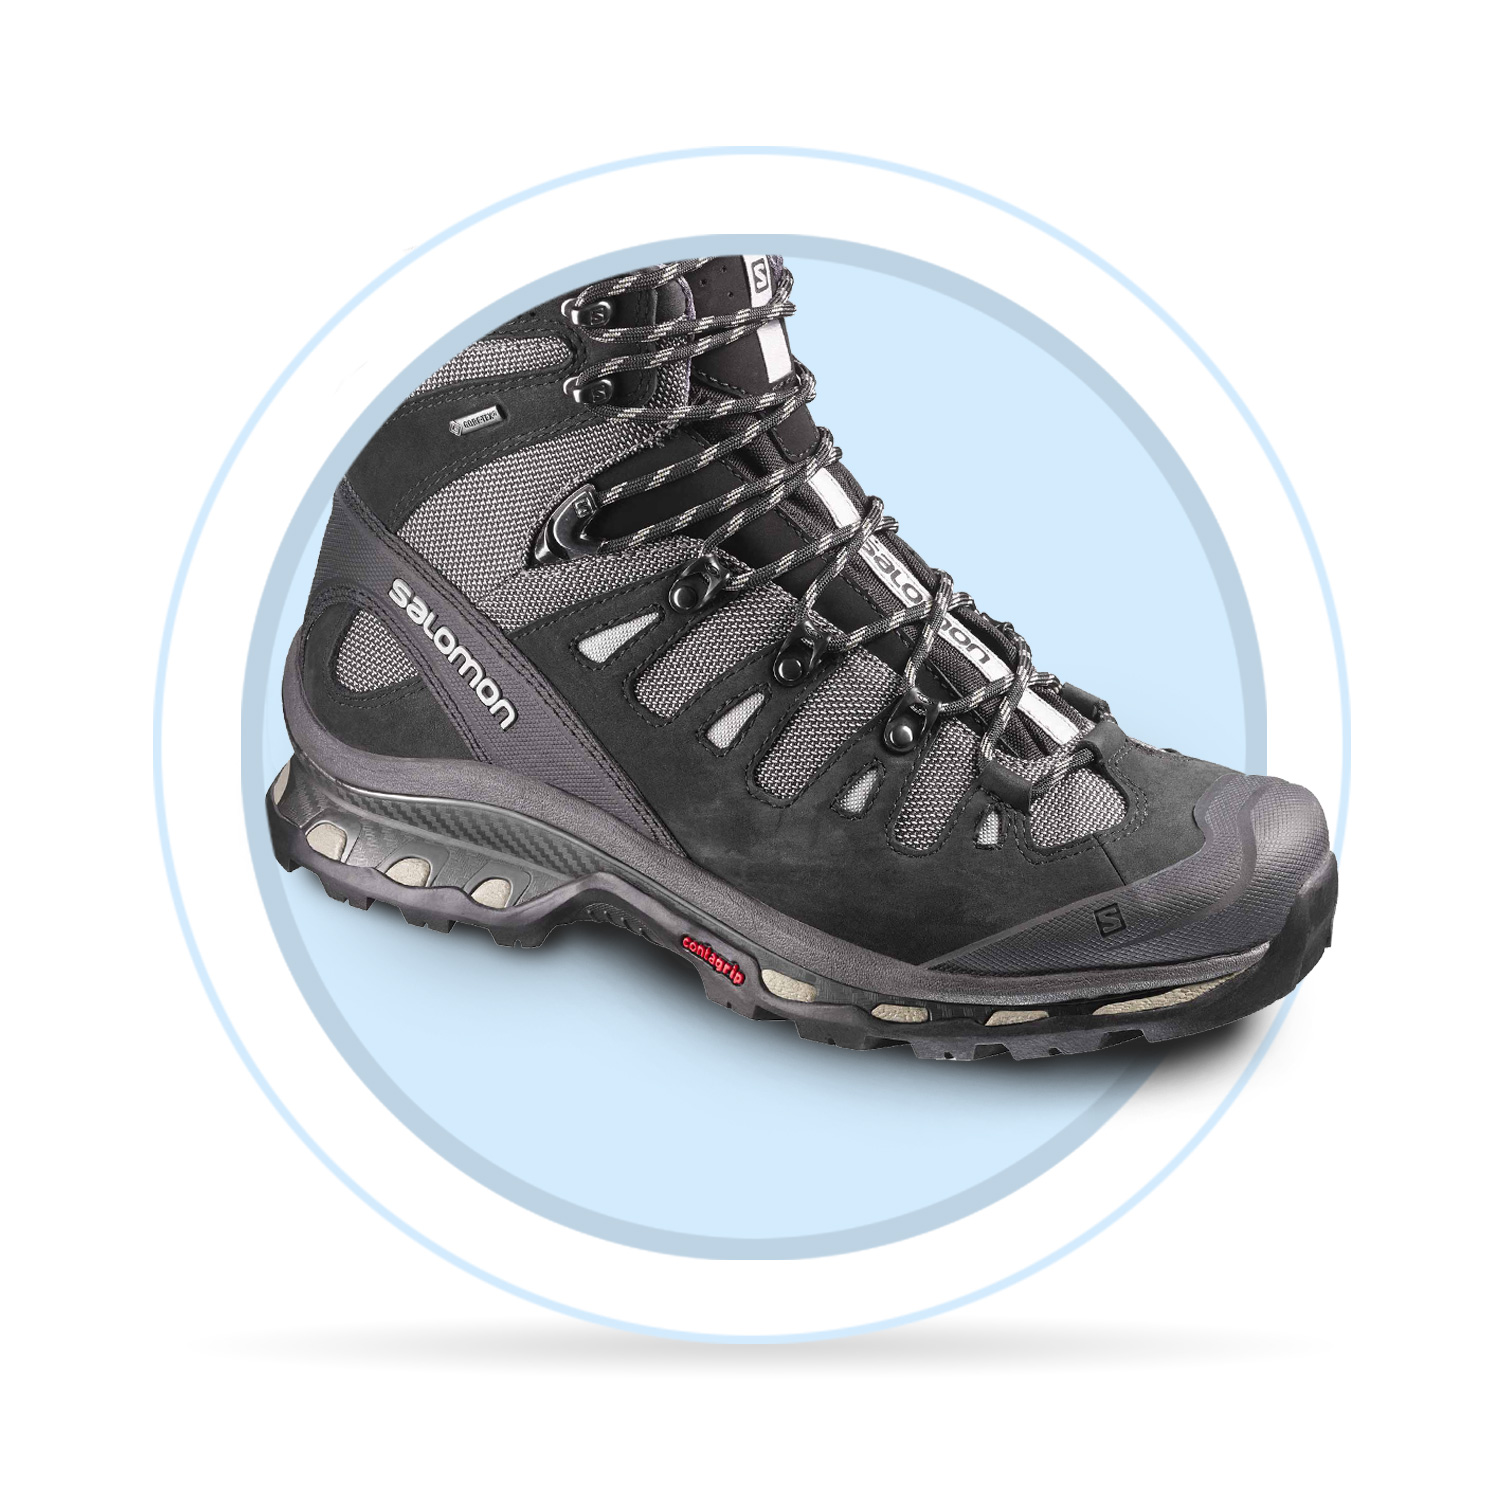 412c4ec08c465 Obuwie trekkingowe poradnia | sportisimo.pl